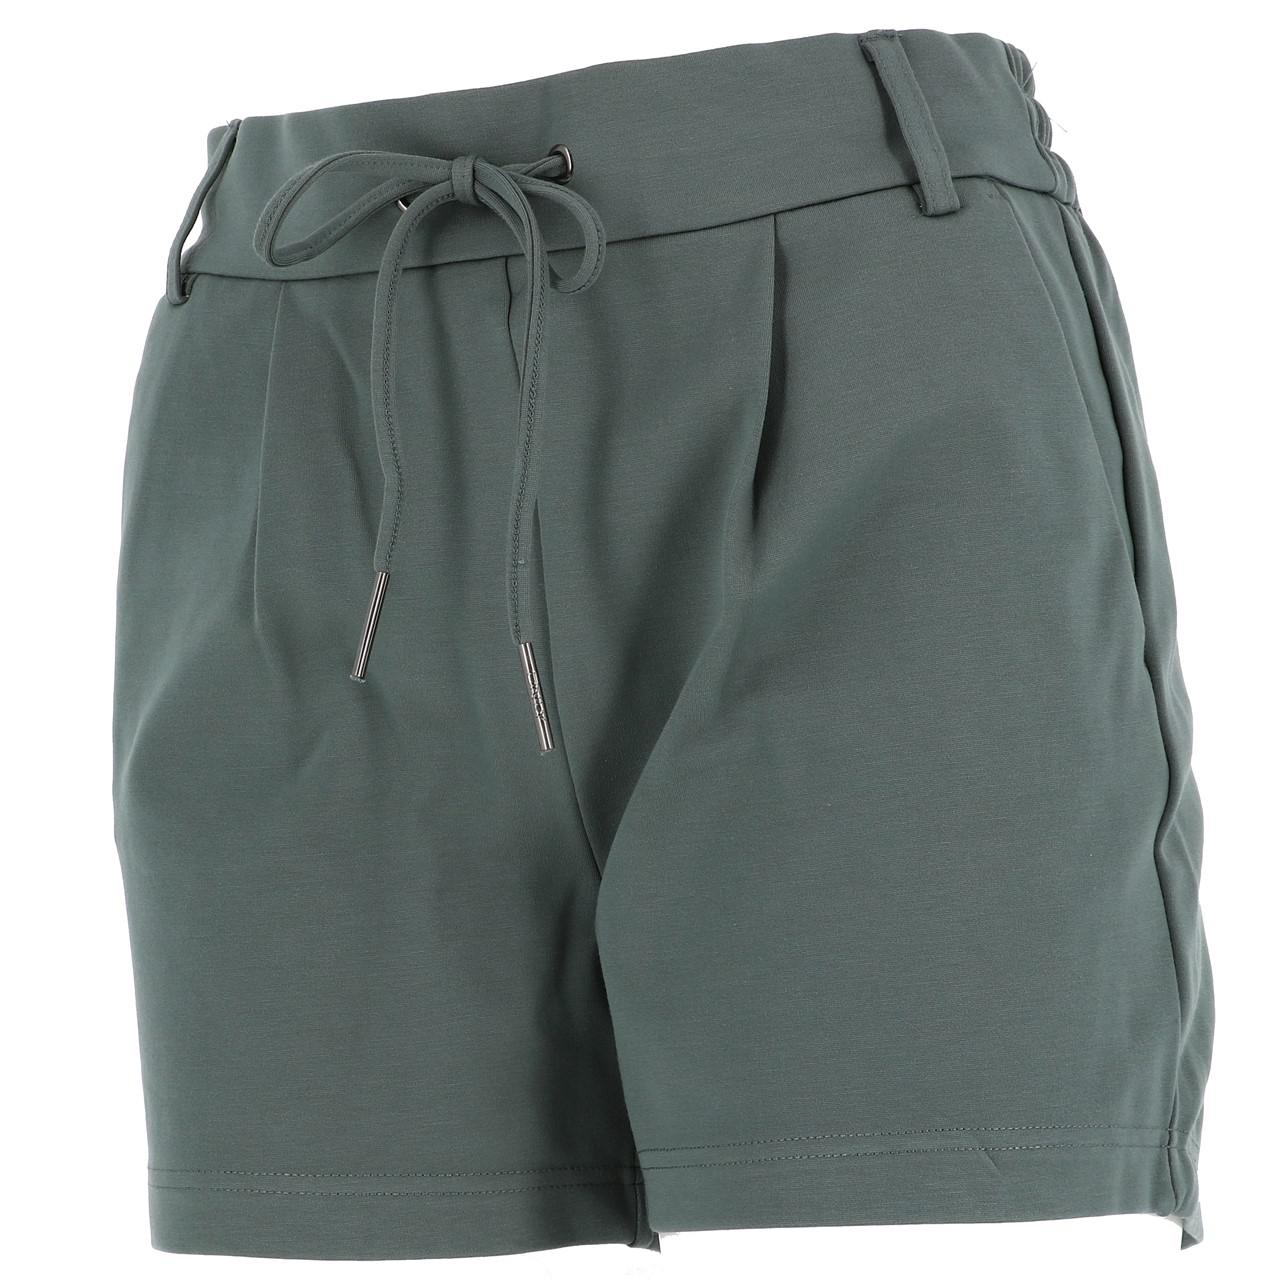 Bermuda-Shorts-Only-Poptrash-Lt-Khaki-Shorts-Green-18701-New